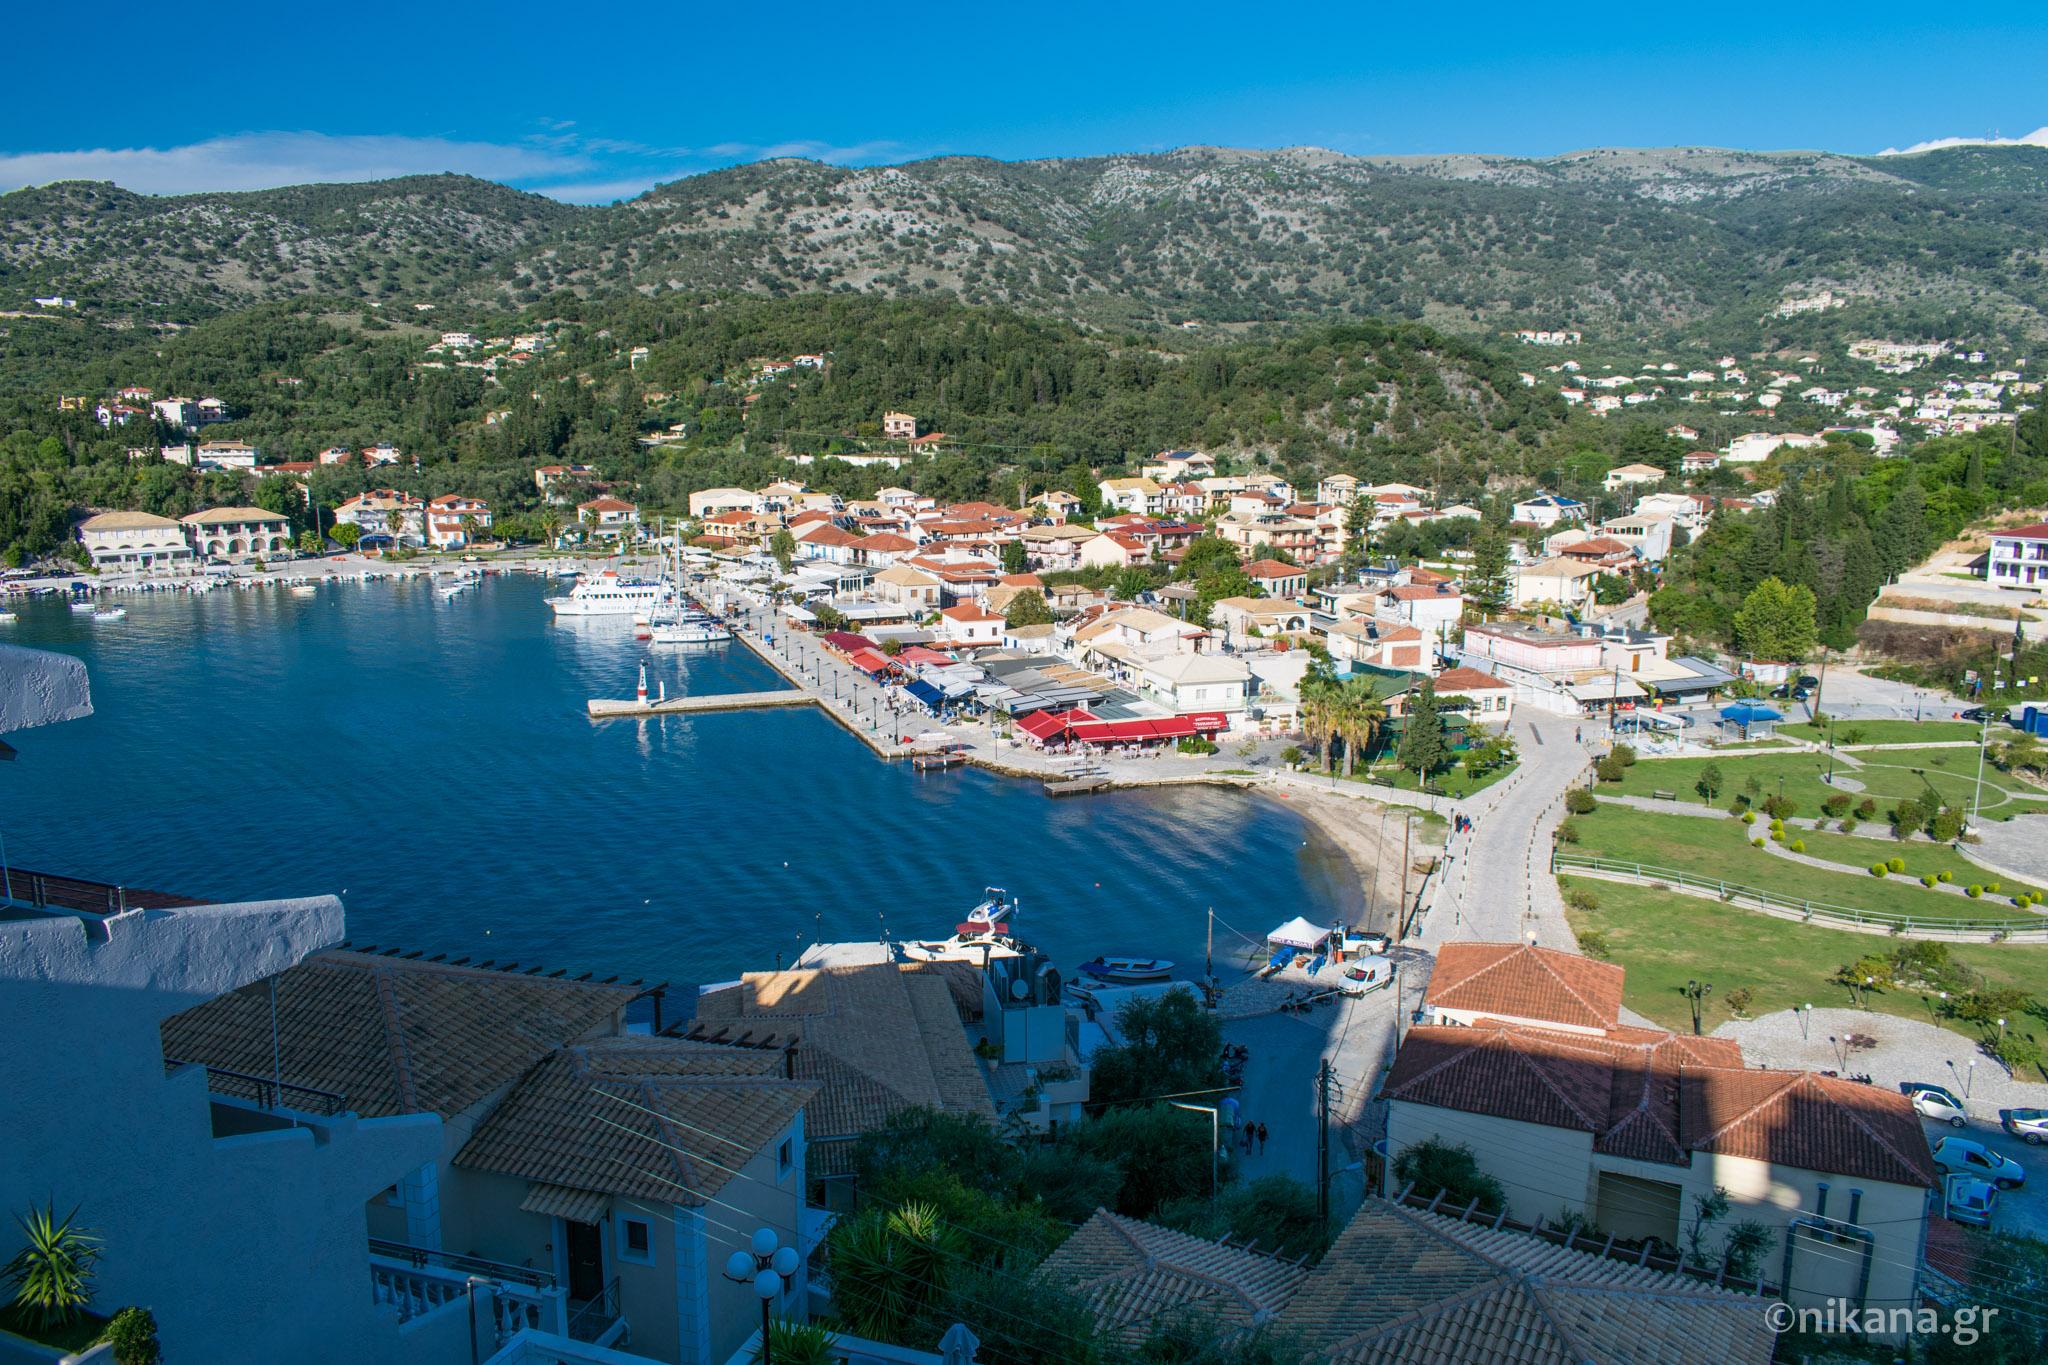 Sivota Epirus Tourist Guide Nikana Gr